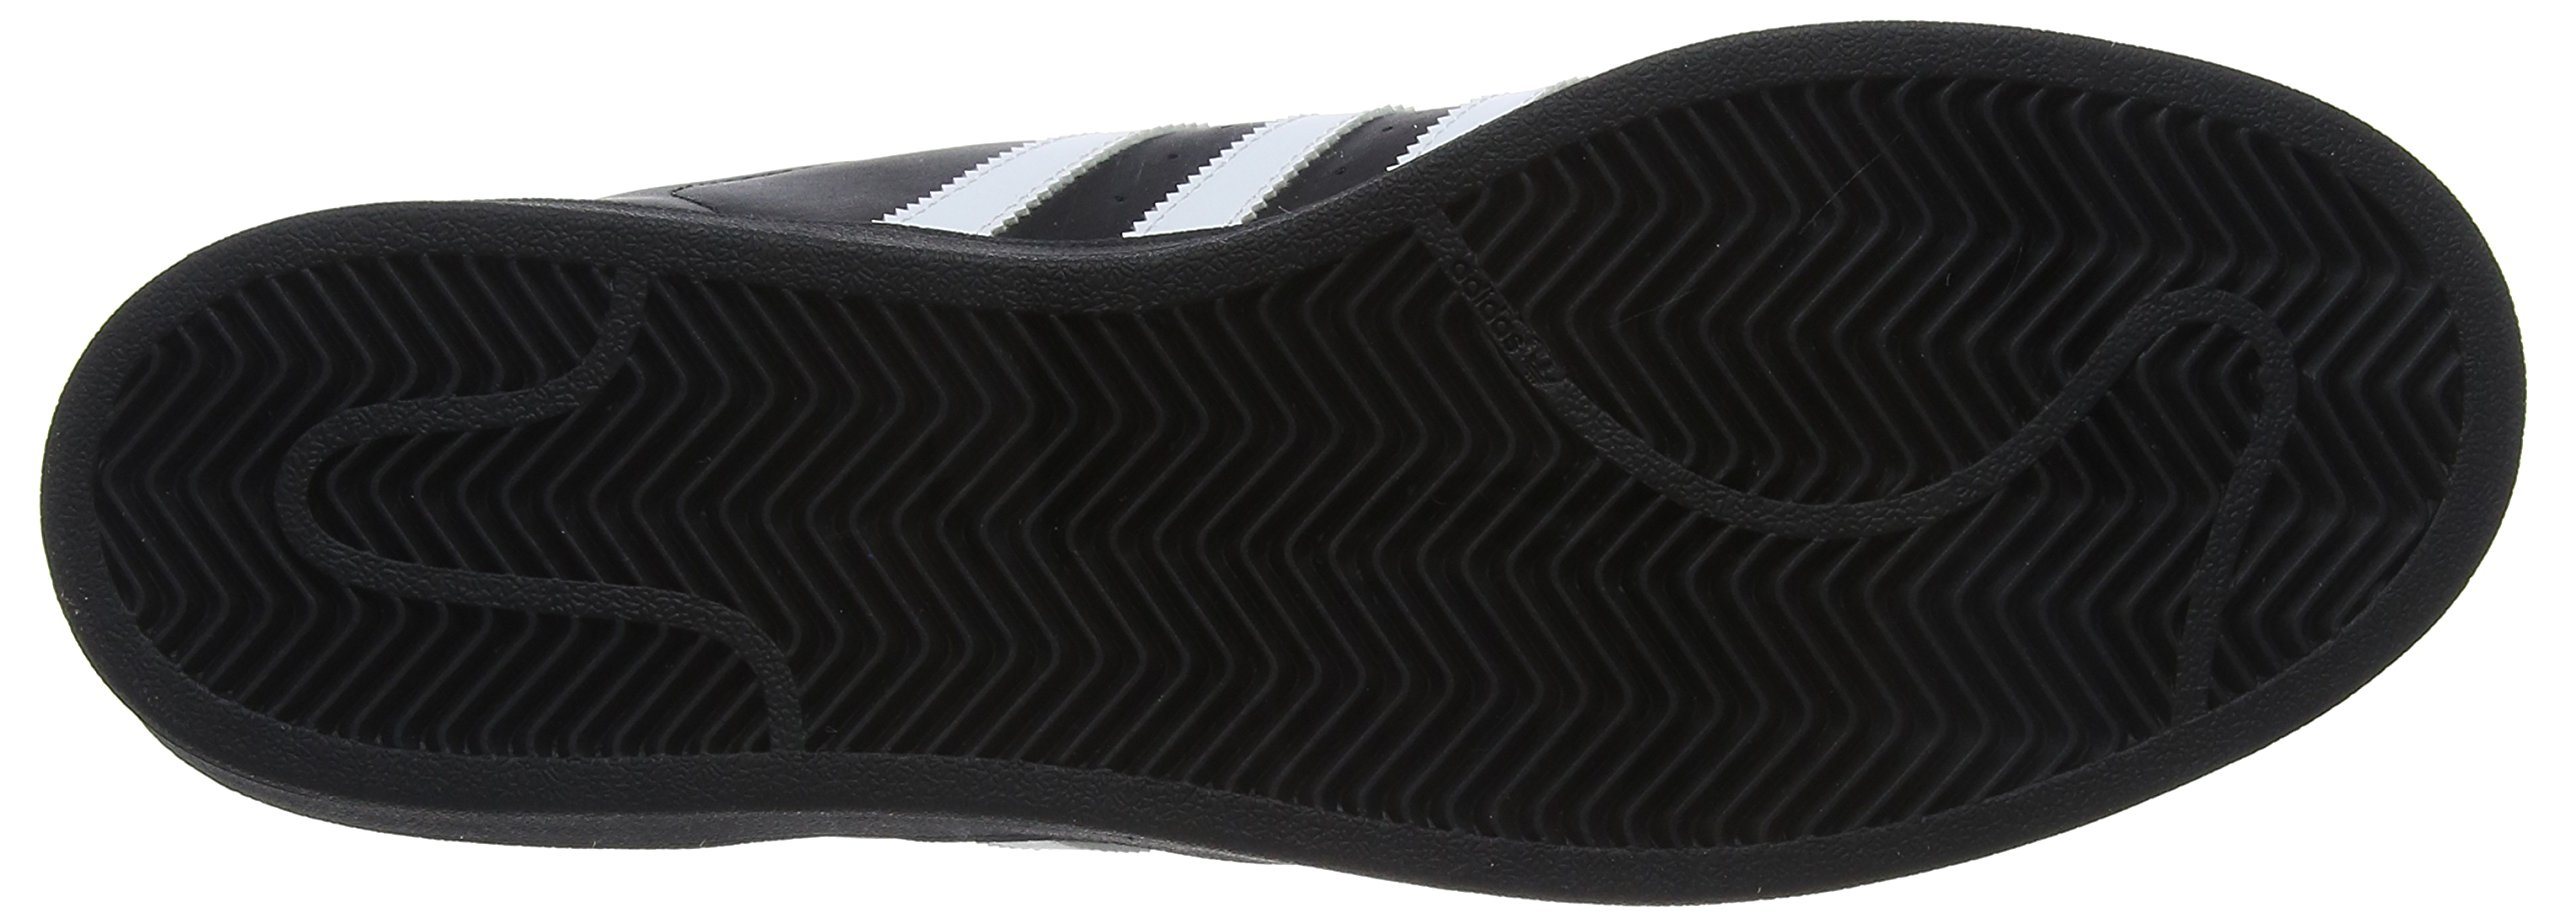 Adidas Originals Superstar Foundation Scarpe da Ginnastica Unisex - Adulto 3 spesavip